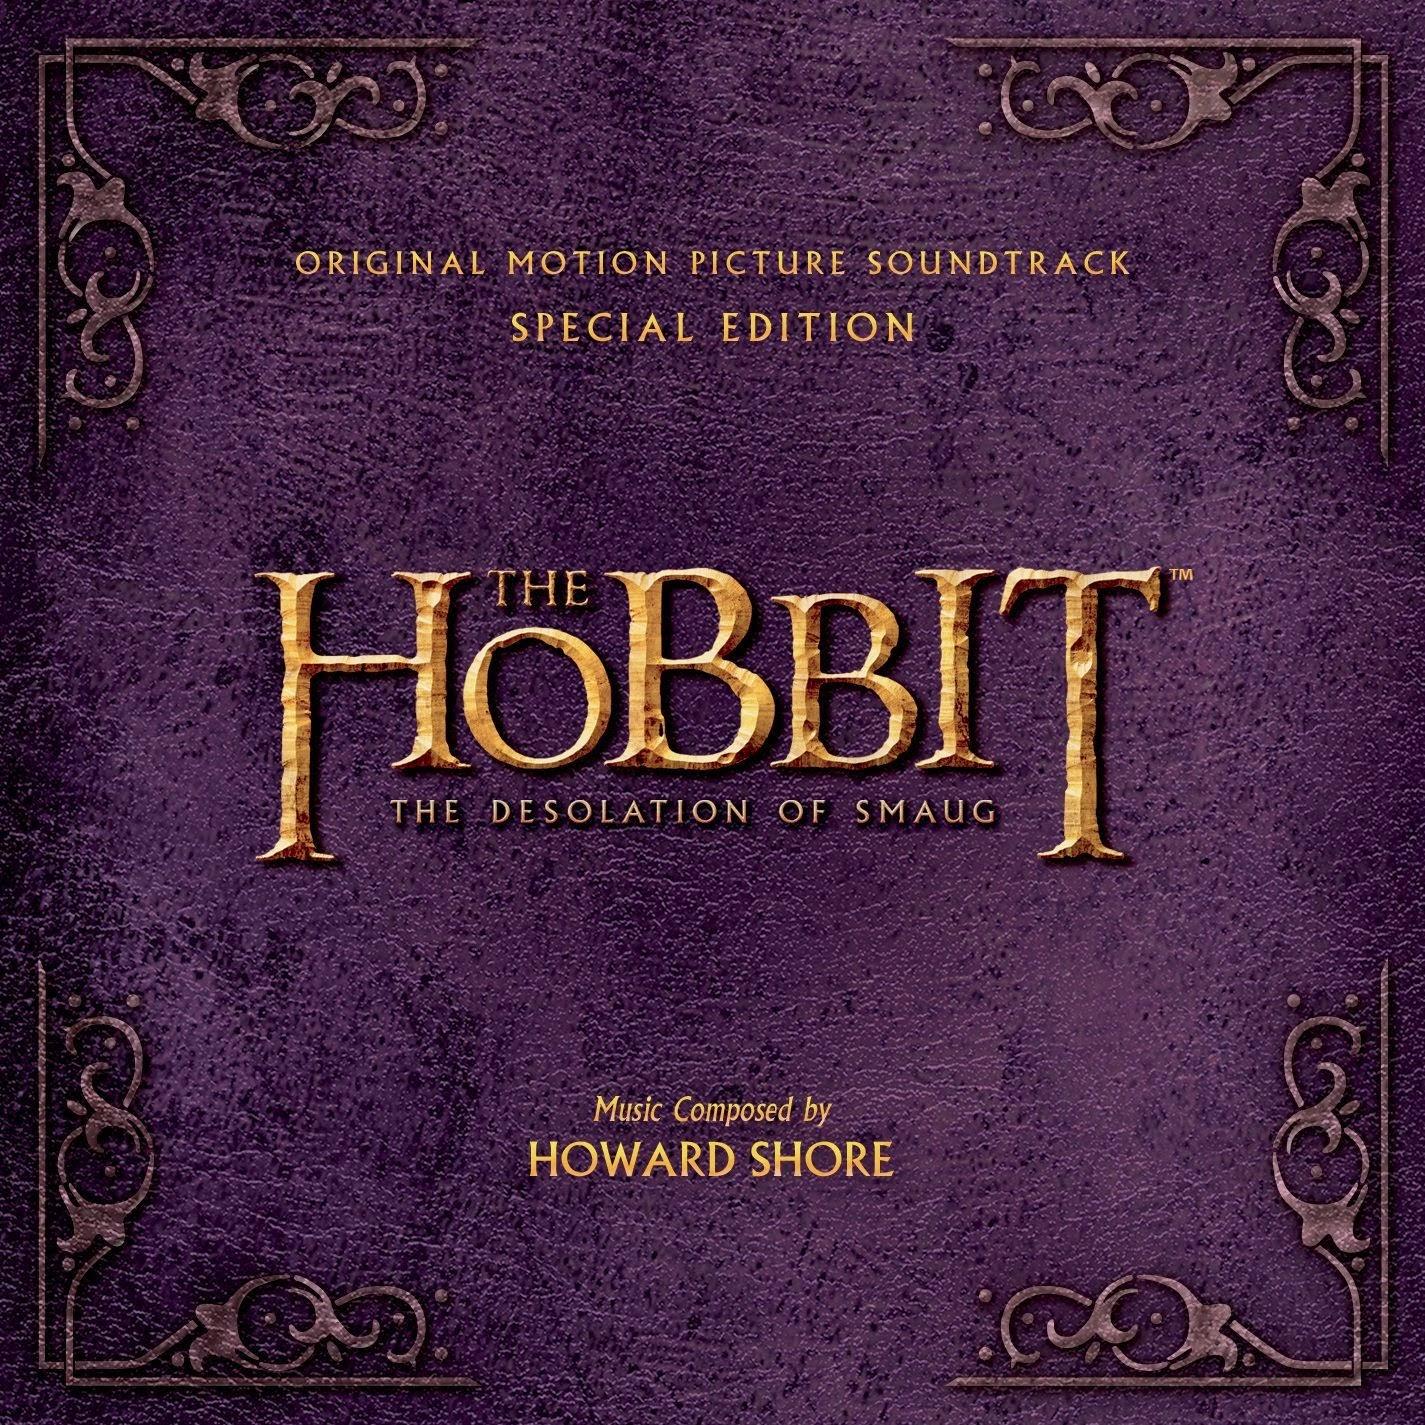 Desolation  of Smaug soundtrack special edition